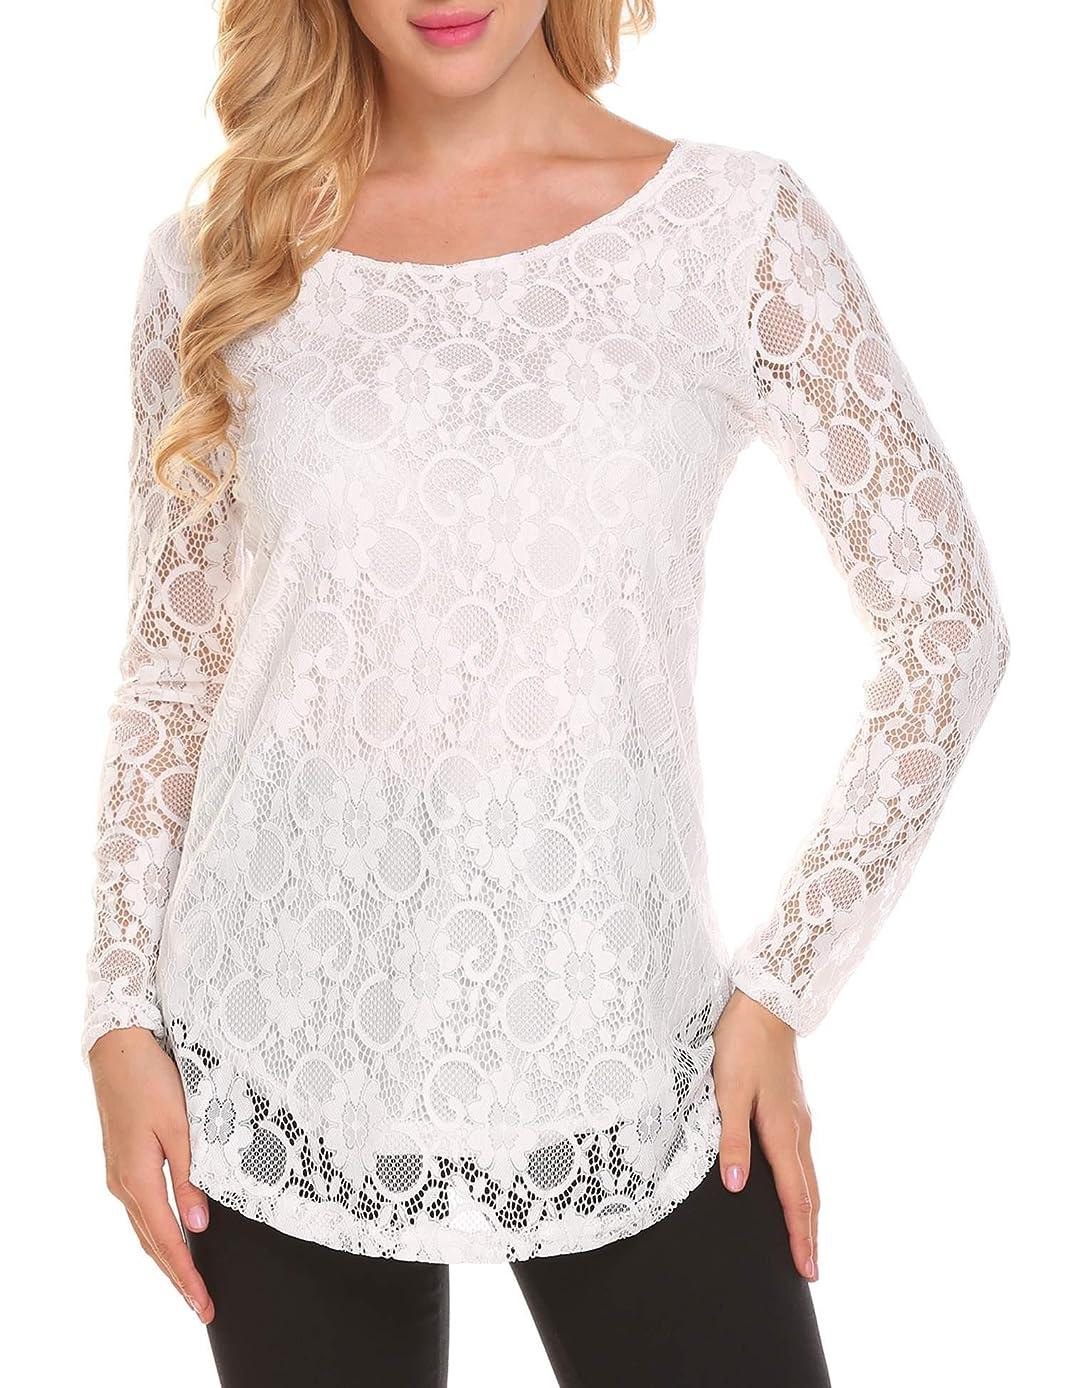 SoTeer Women's Lace Casual Tops Short Sleeve/Long Sleeve Boho Elegant Casual Loose Blouse Shirts